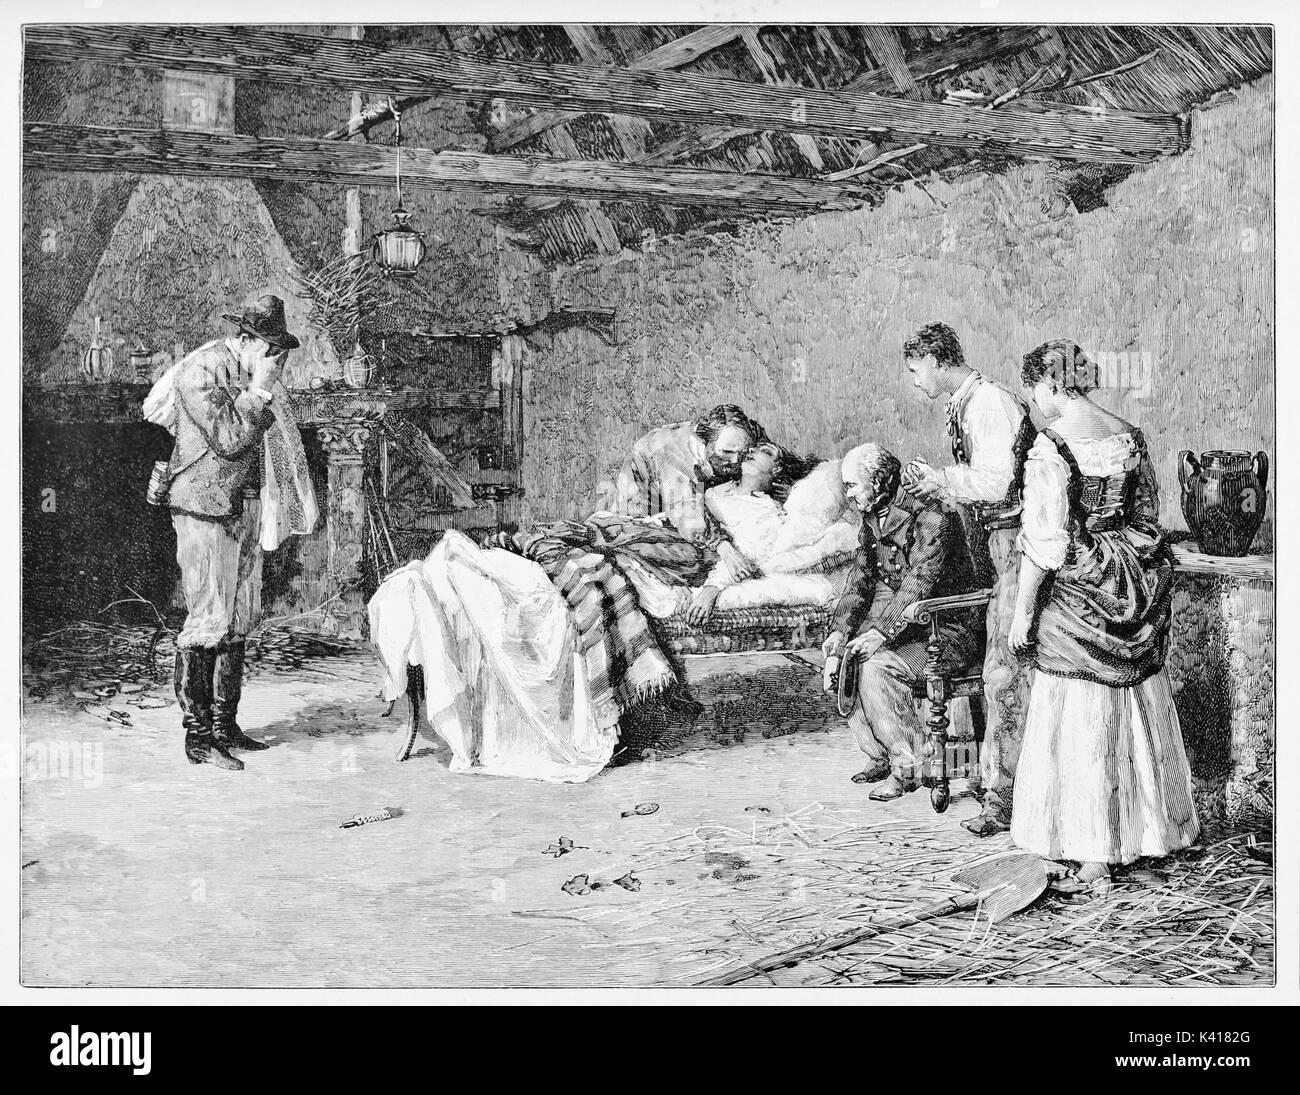 Anciana en la cama morir abrazado por su marido. Anita muerte en Marqués' Guiccioli cortijo con Garibaldi junto a ella. Por E. Matania, sobre Garibaldi e i suoi Tempi, Milán, Italia 1884 Foto de stock